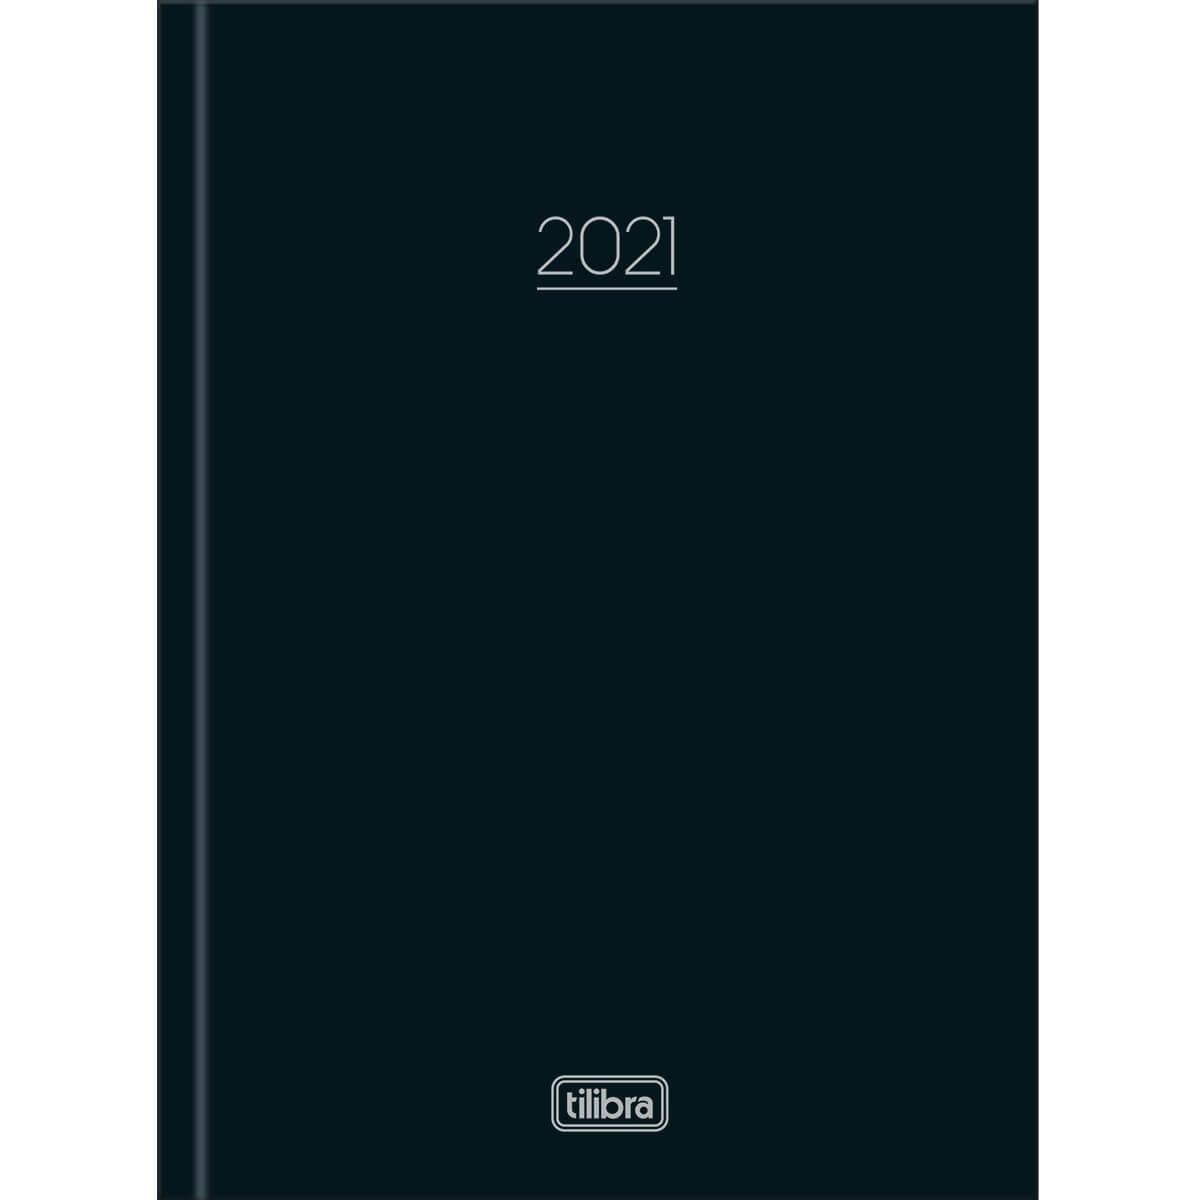 Agenda 2021 costurado 160 fls preto Pepper M4 Tilibra